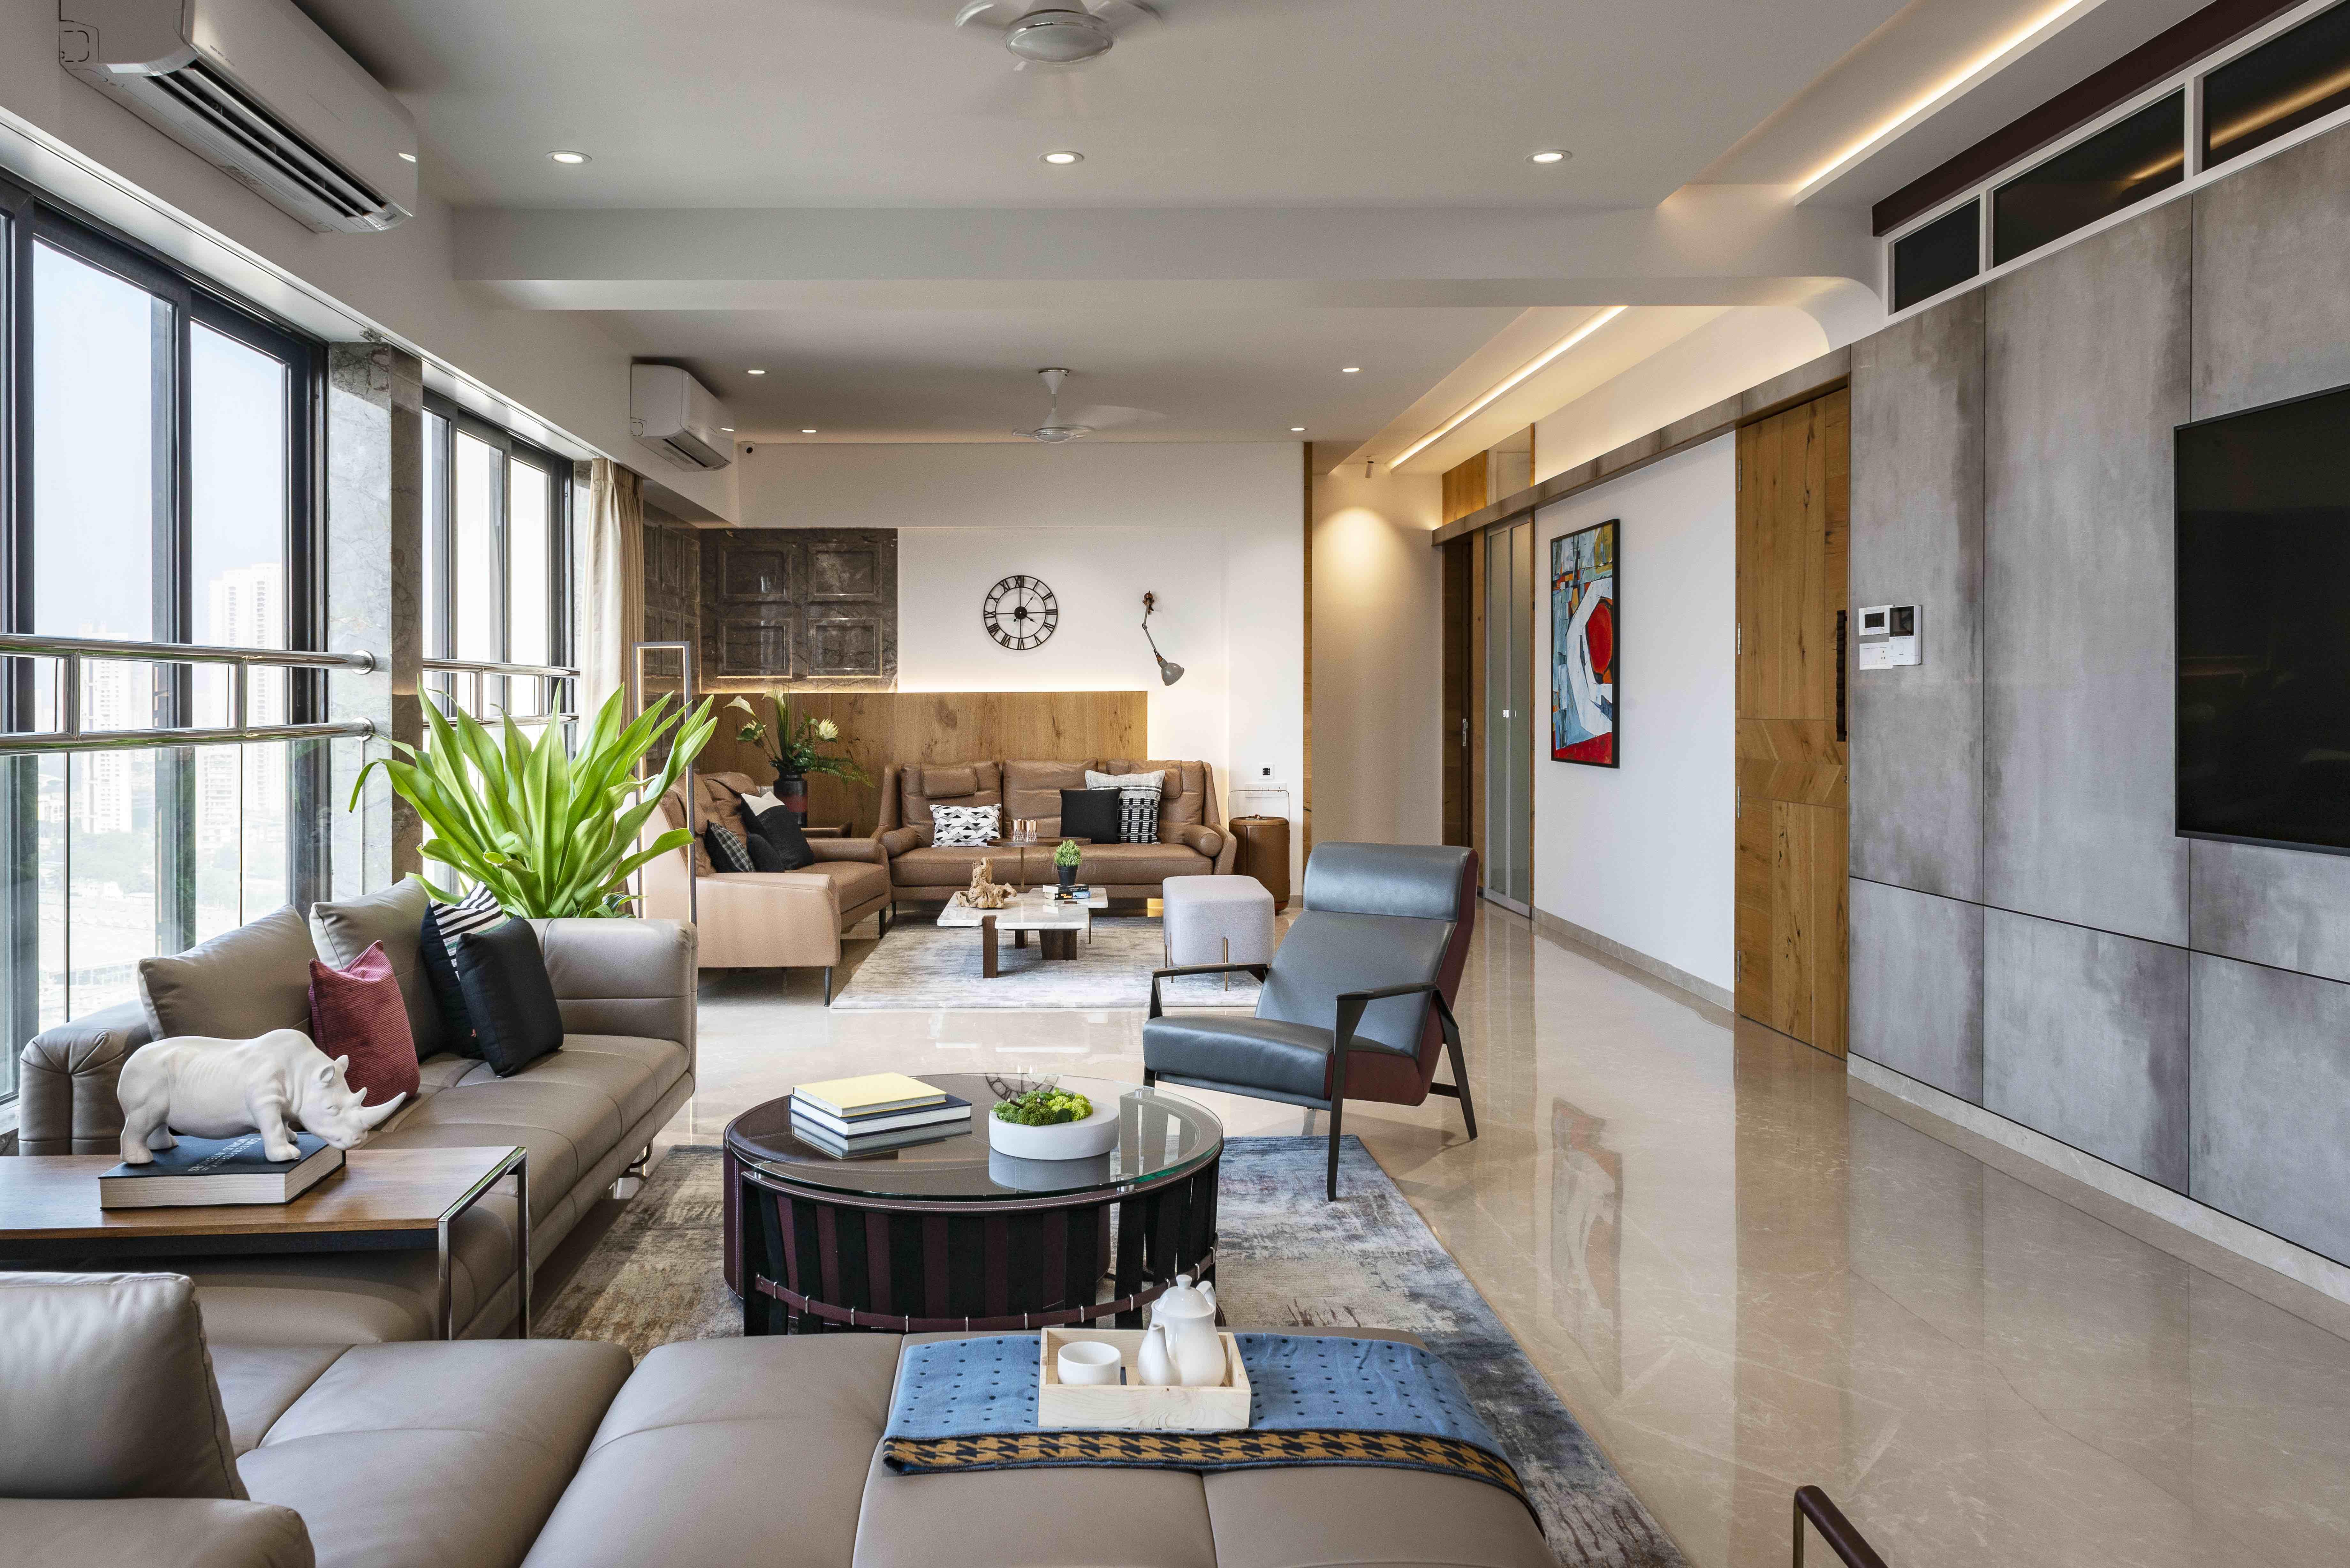 Gaurav Kharkar & Associates showcases effortless harmony across multiple design styles in this contemporary Mumbai apartment